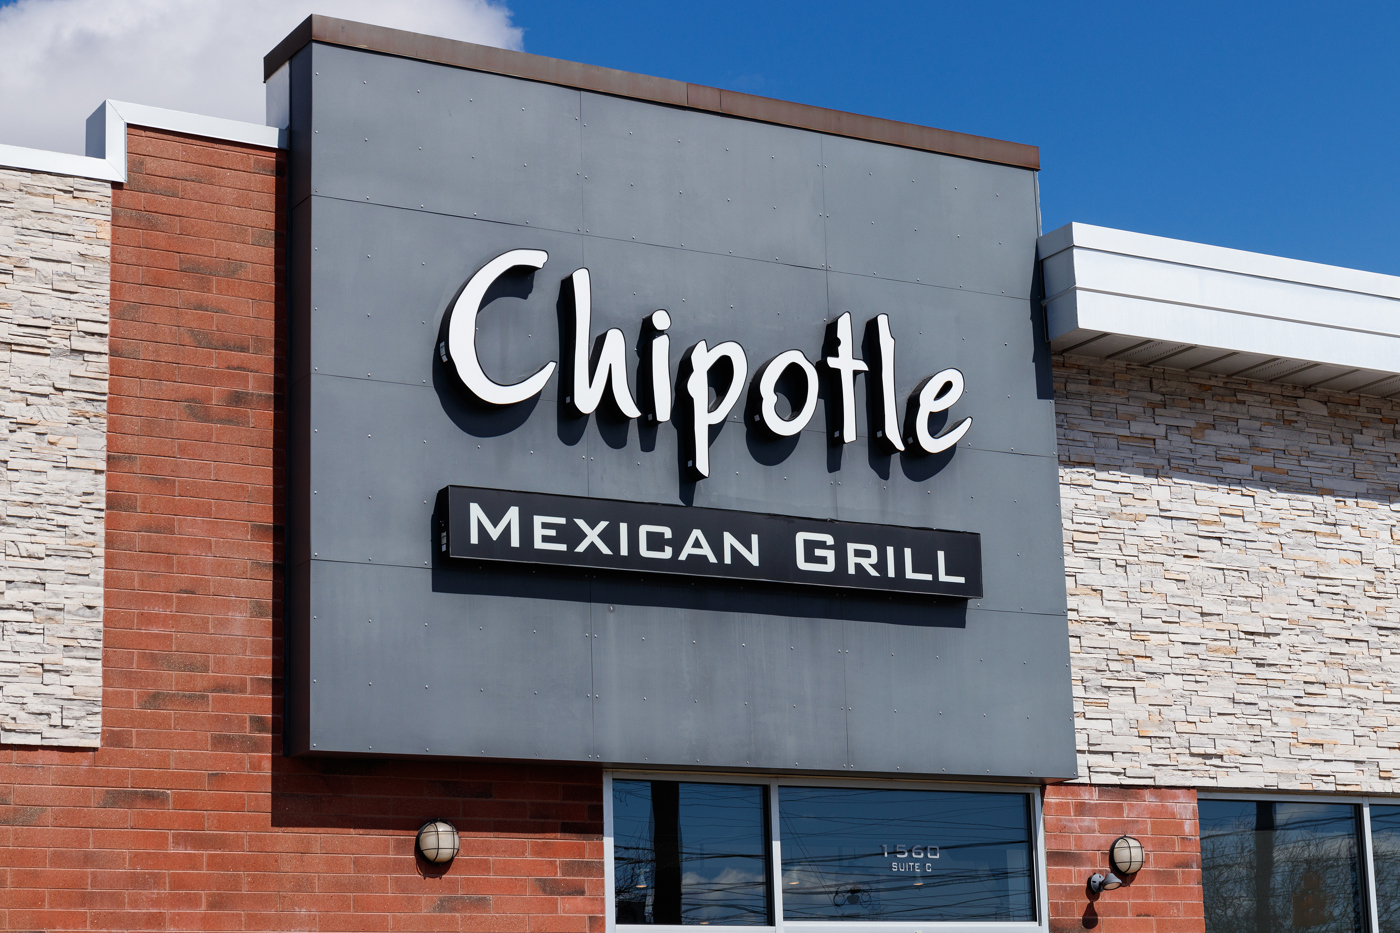 Chipotle stock, CMG stock, Restaurant stocks, CMG stock news